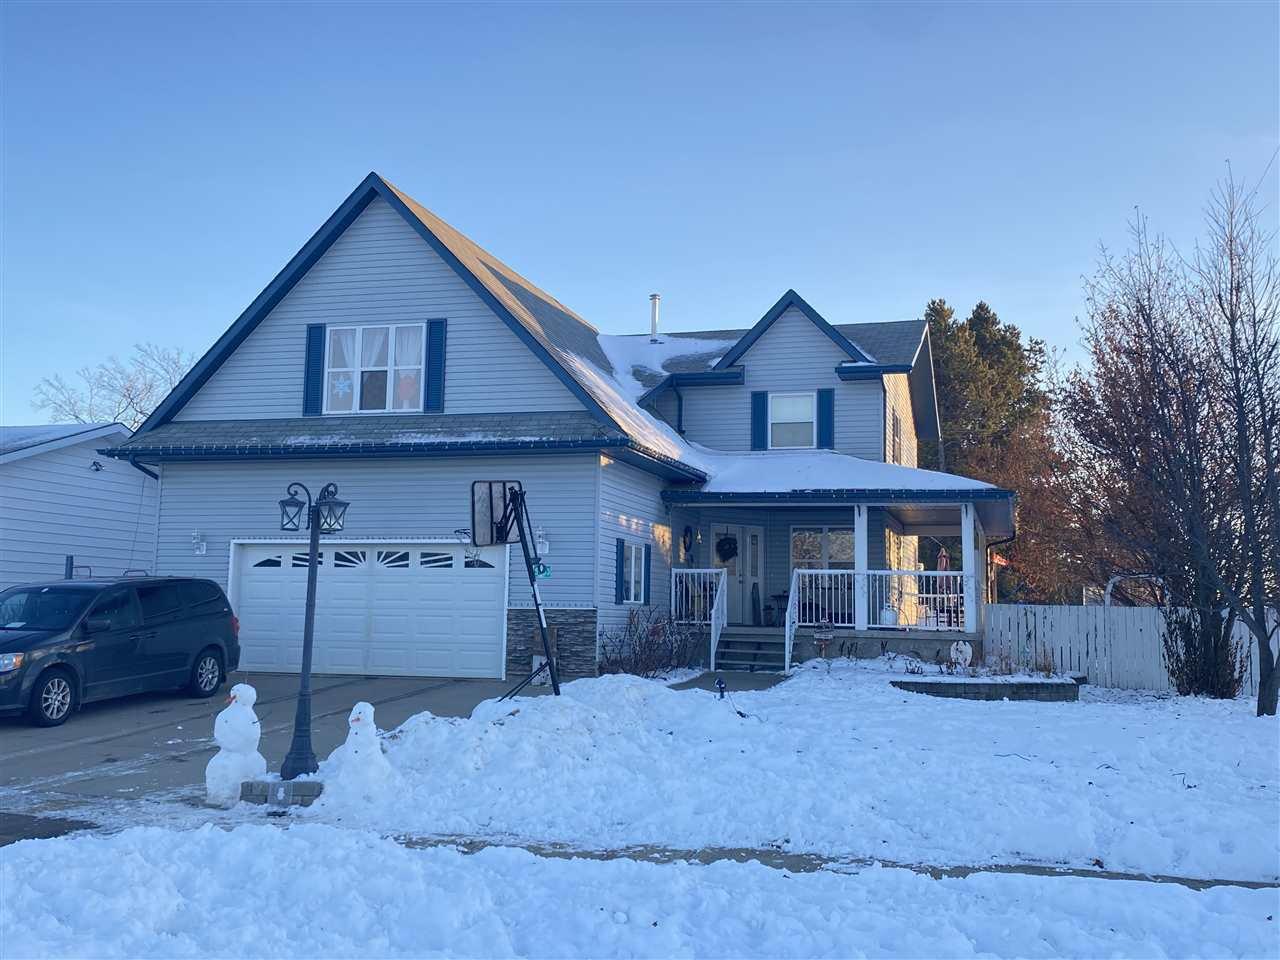 Main Photo: 5203 51 Avenue: Pickardville House for sale : MLS®# E4222188